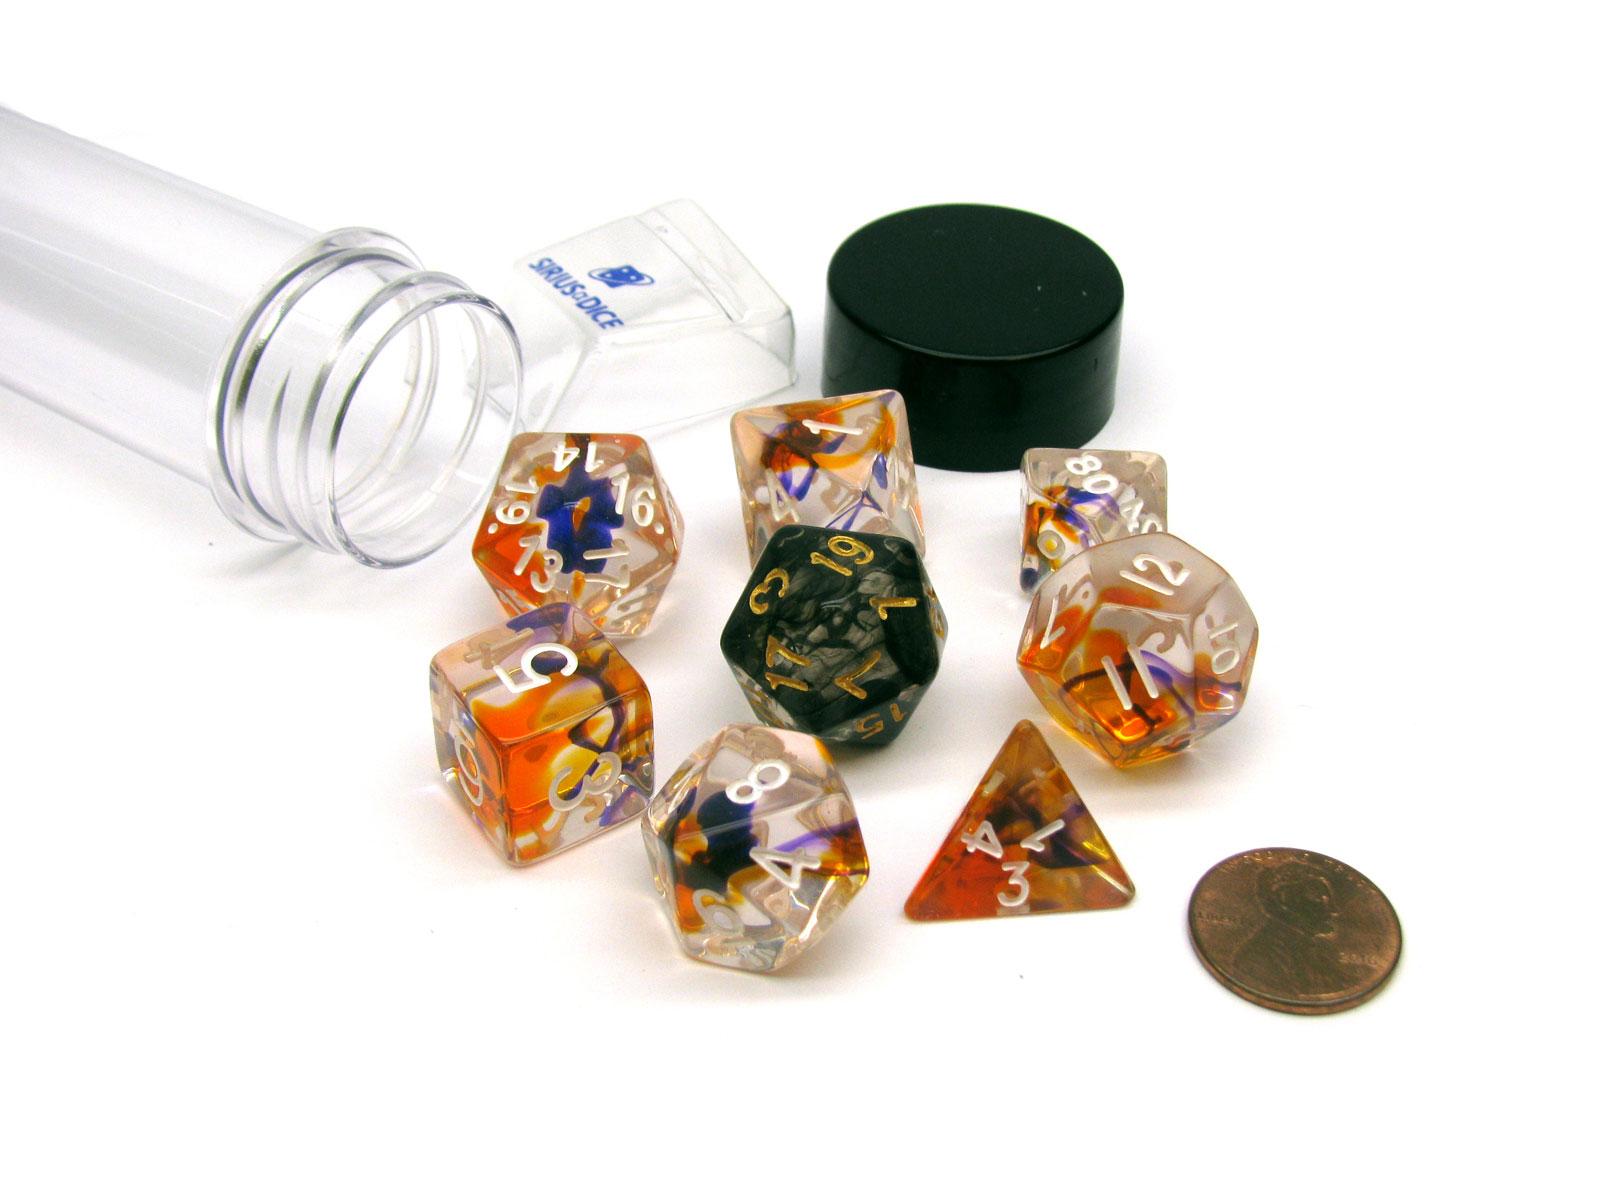 Purple Tube of 7 Polyhedral RPG Sirius Dice with Bonus D20 Orange Clear